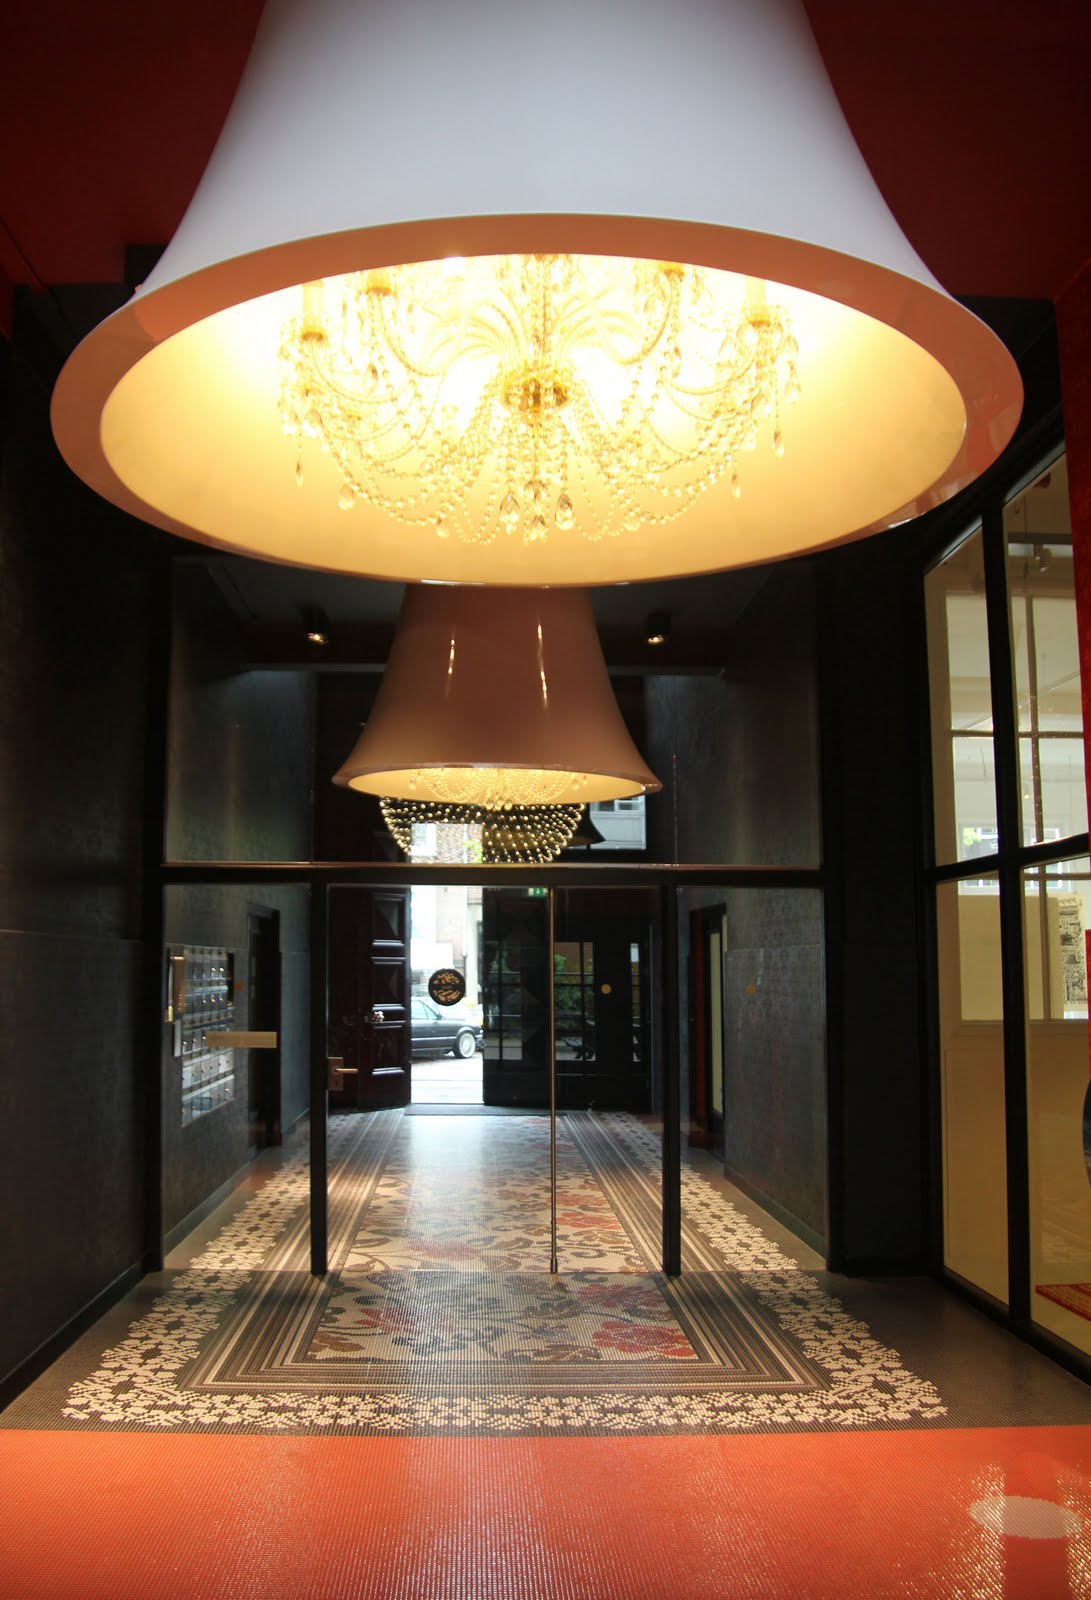 Marcel Wanders Big Ben Lamps | modern design by moderndesign.org